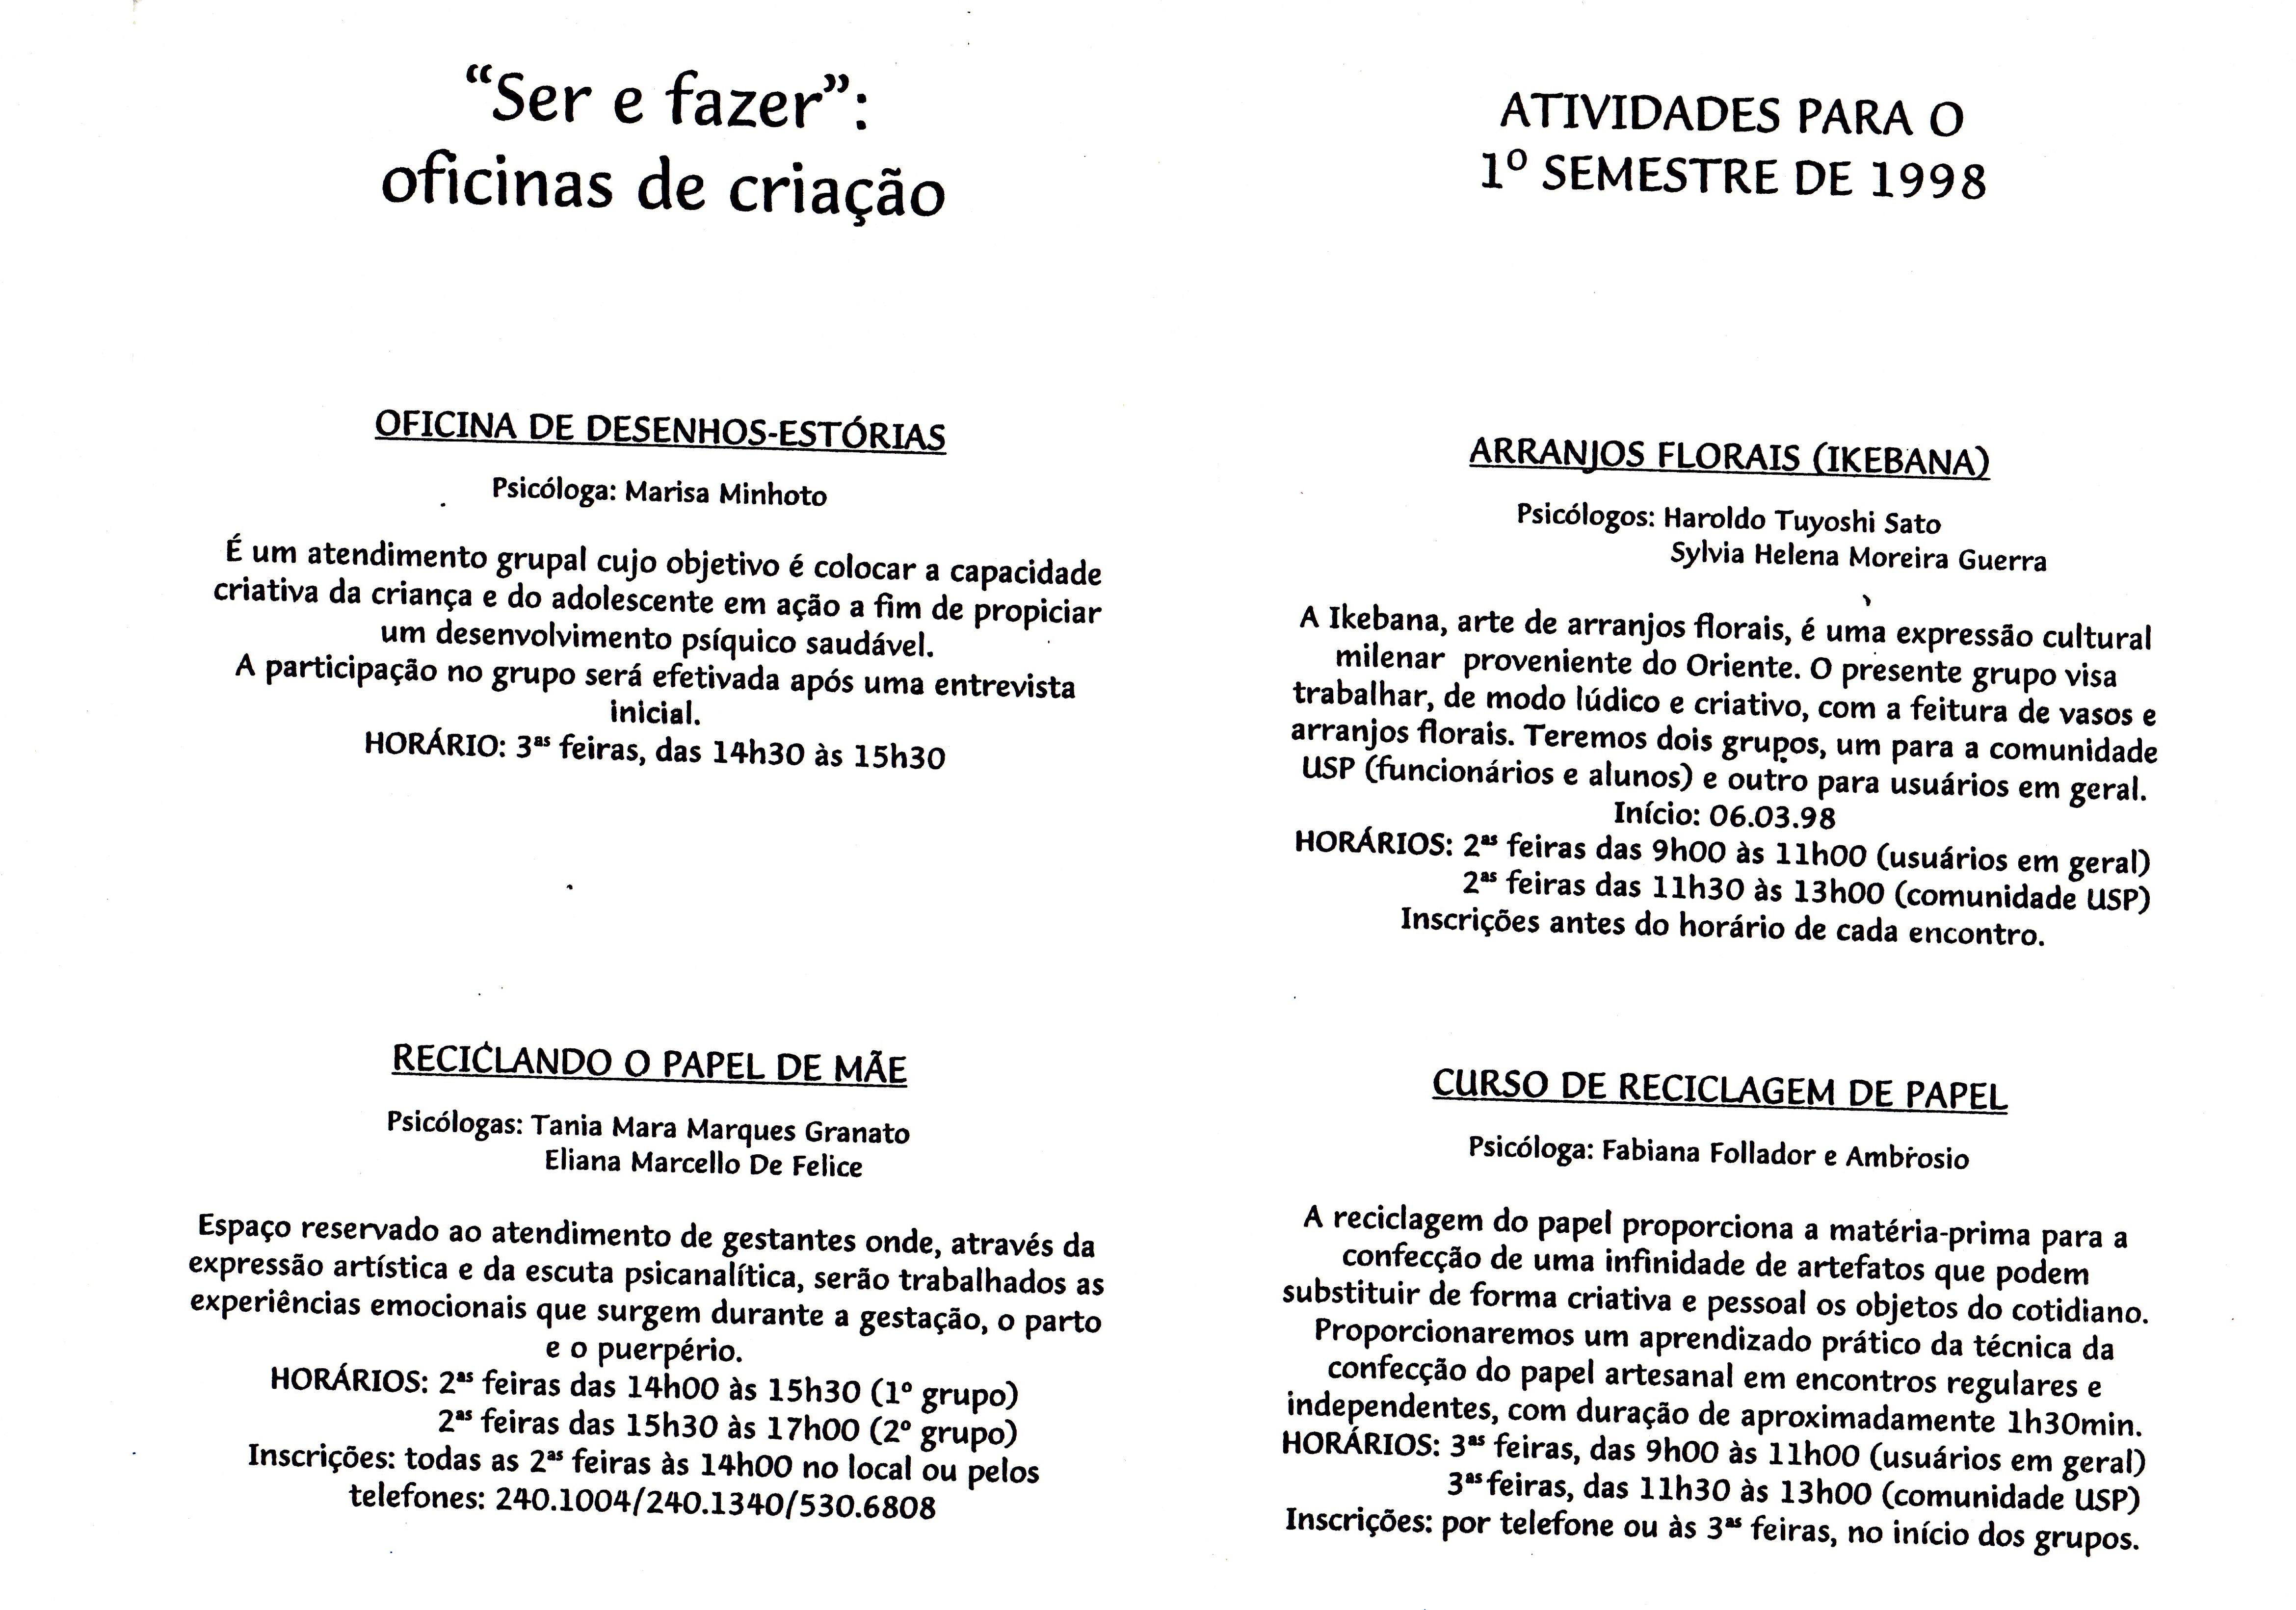 Laboratório Saúde Mental e Psicologia Clínica Social 20 anos 058